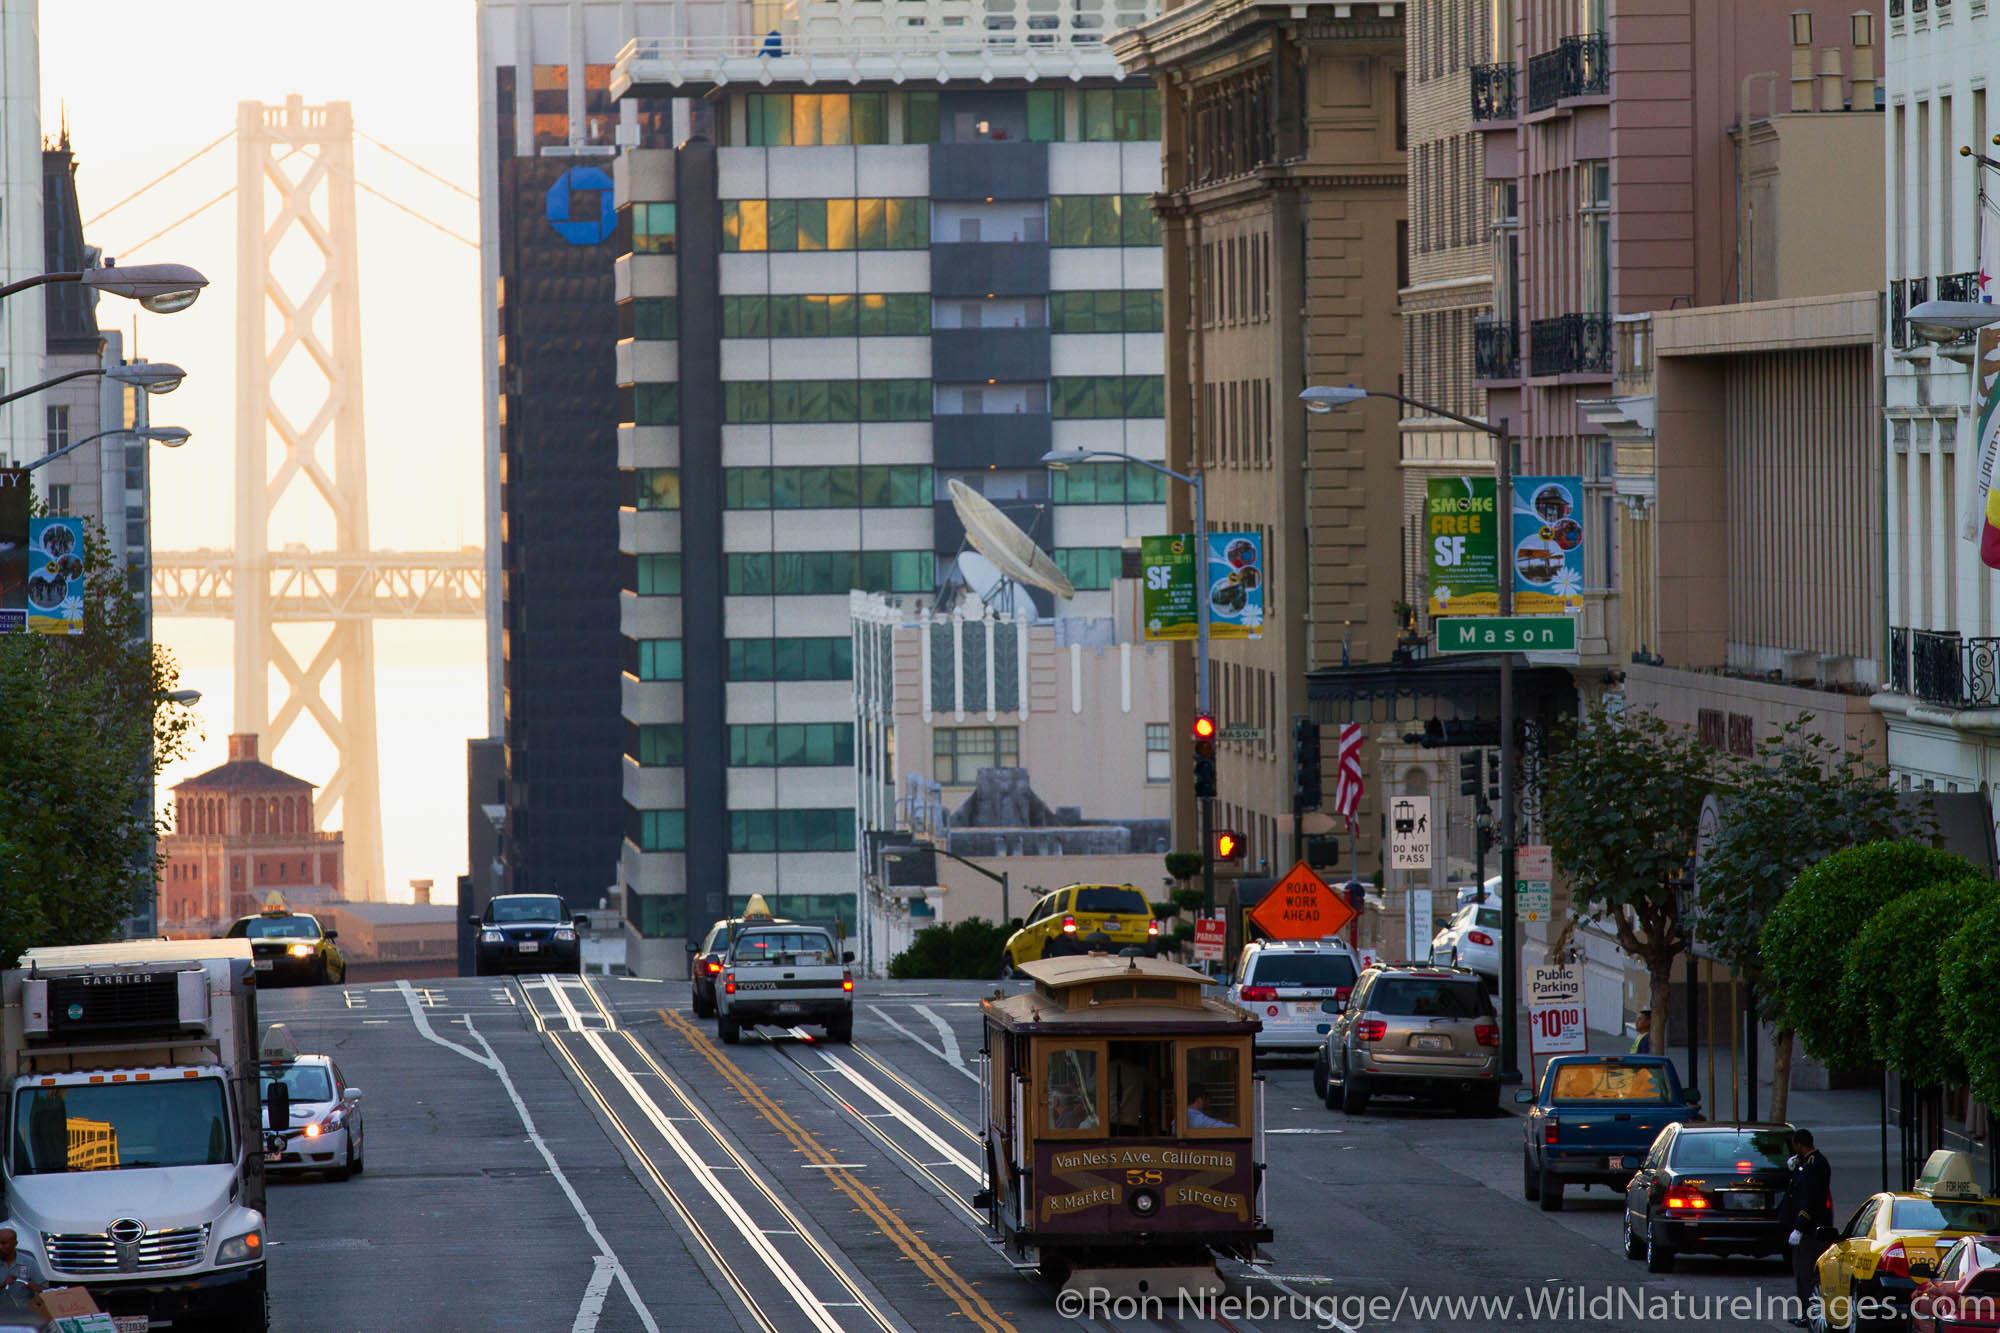 Cable Car makes its way through morning traffic, Bay Bridge in background.  San Francisco, CA